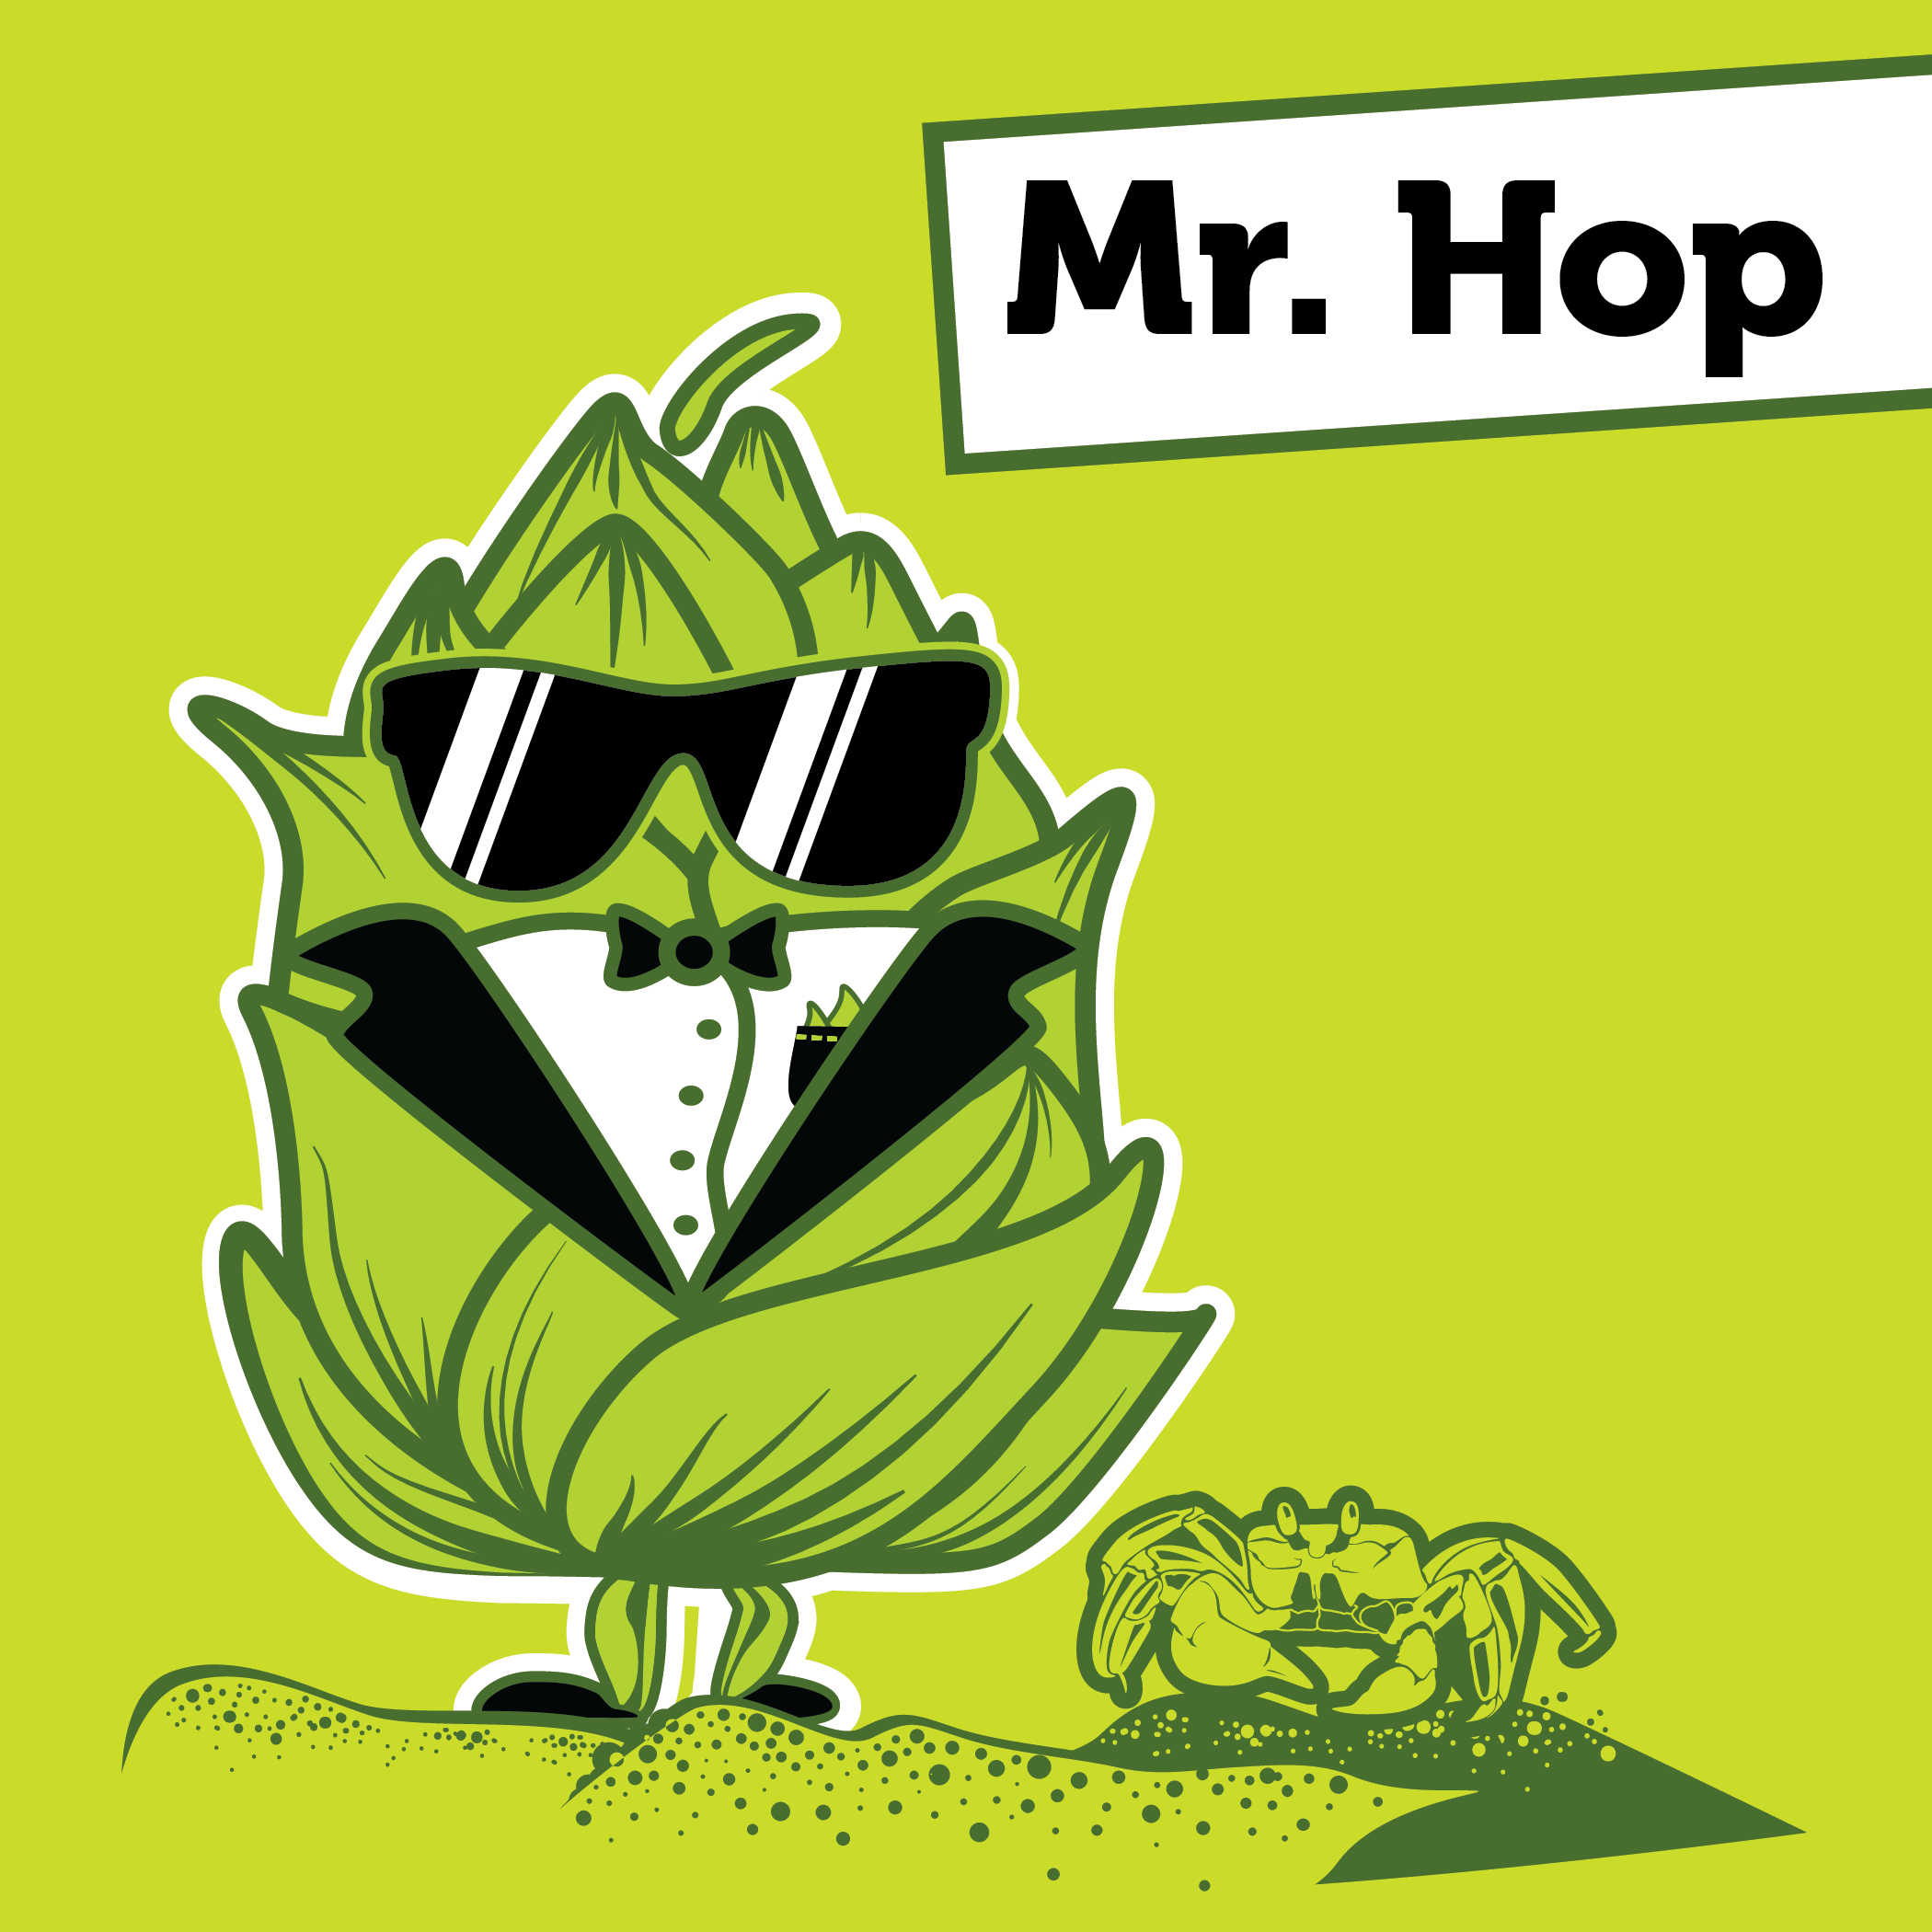 Mr. Hop